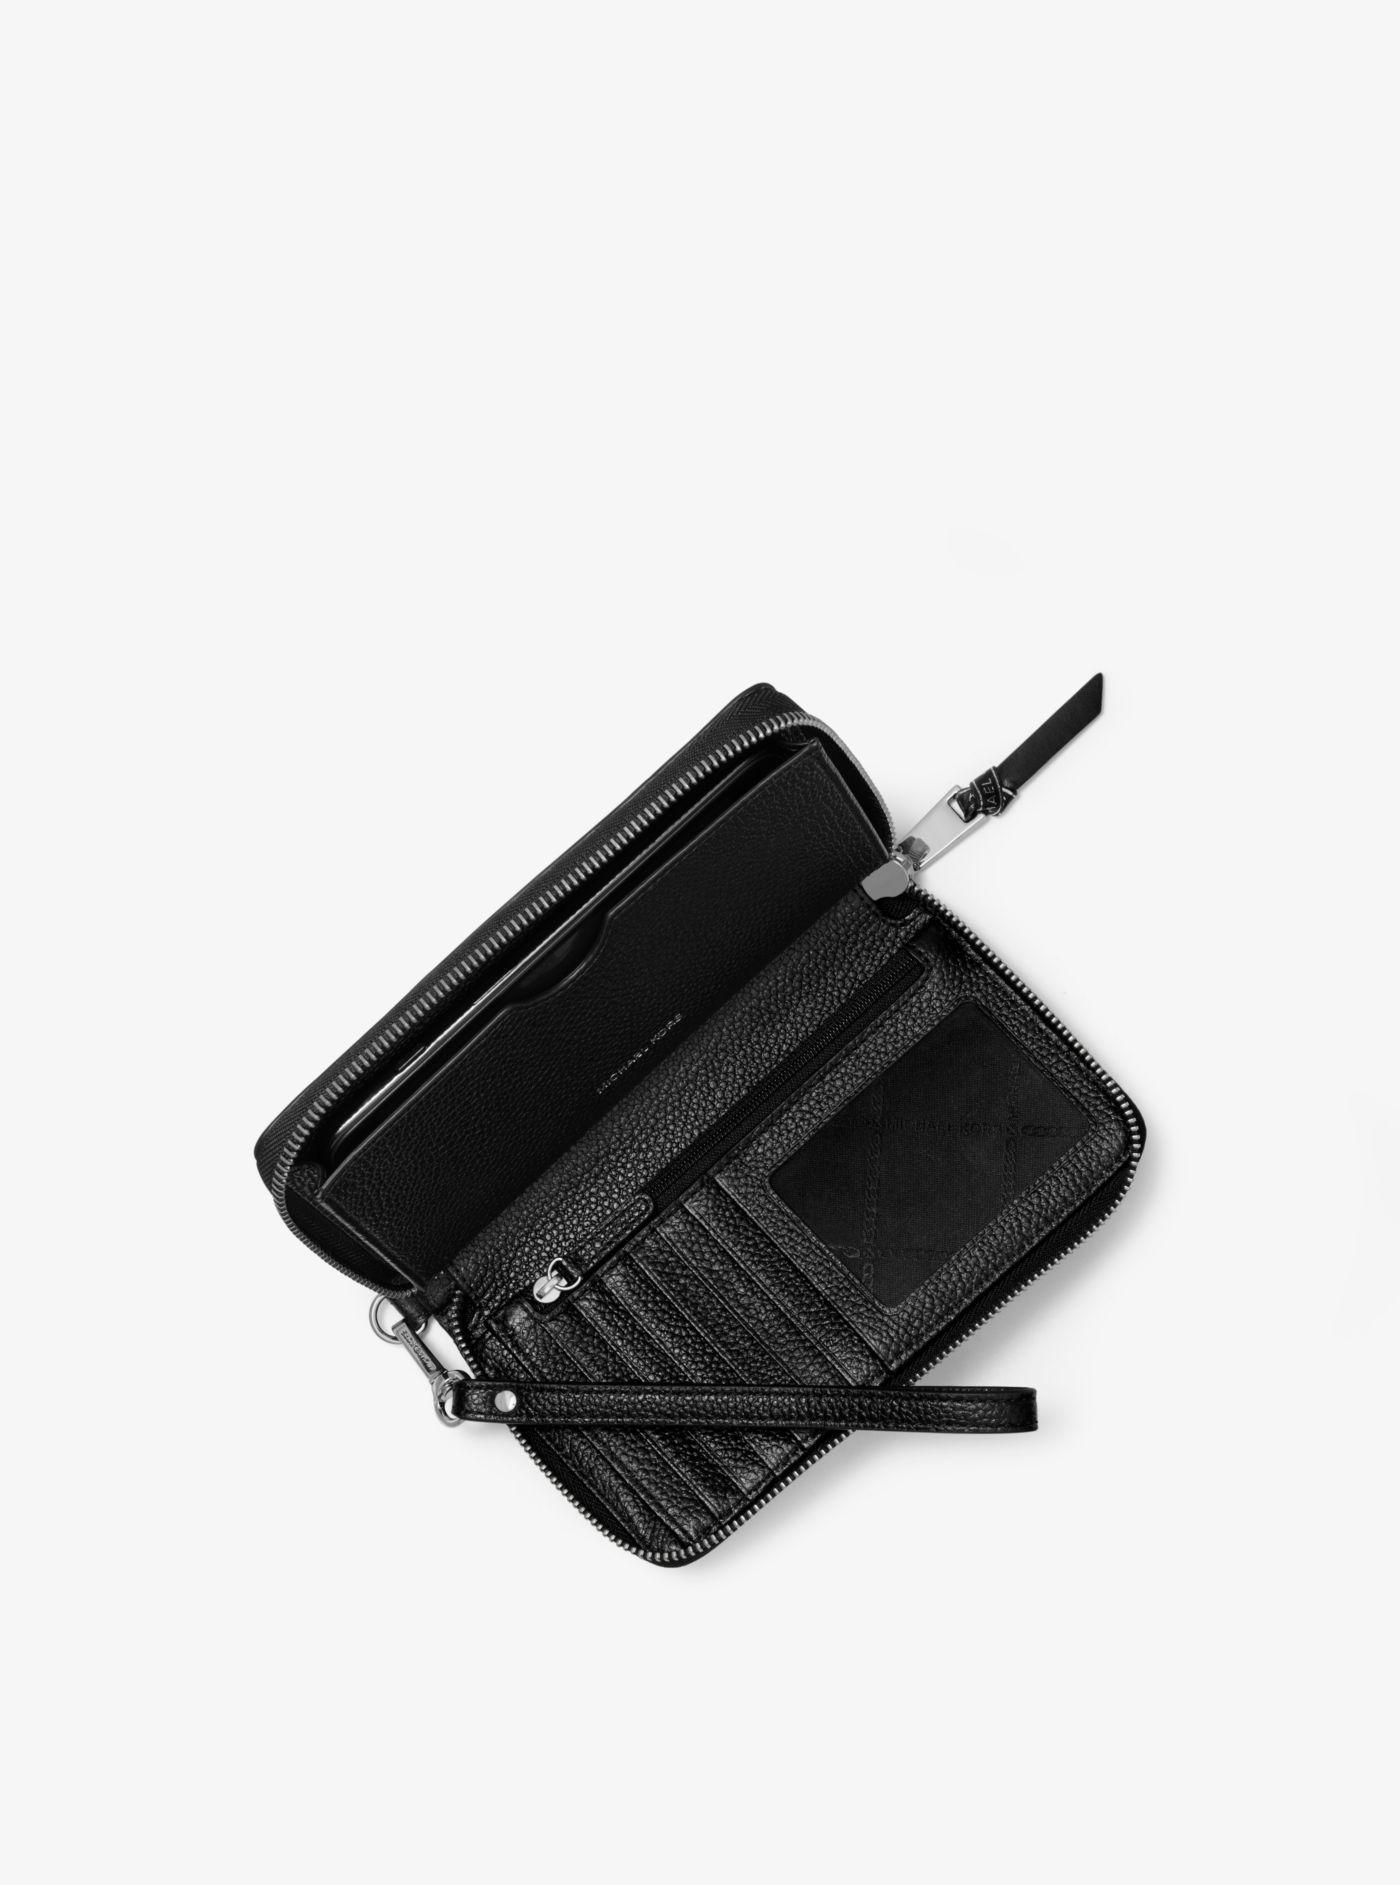 350e2f8c64c3 Michael Kors - Black Large Striped Pebbled Leather Smartphone Wristlet -  Lyst. View fullscreen